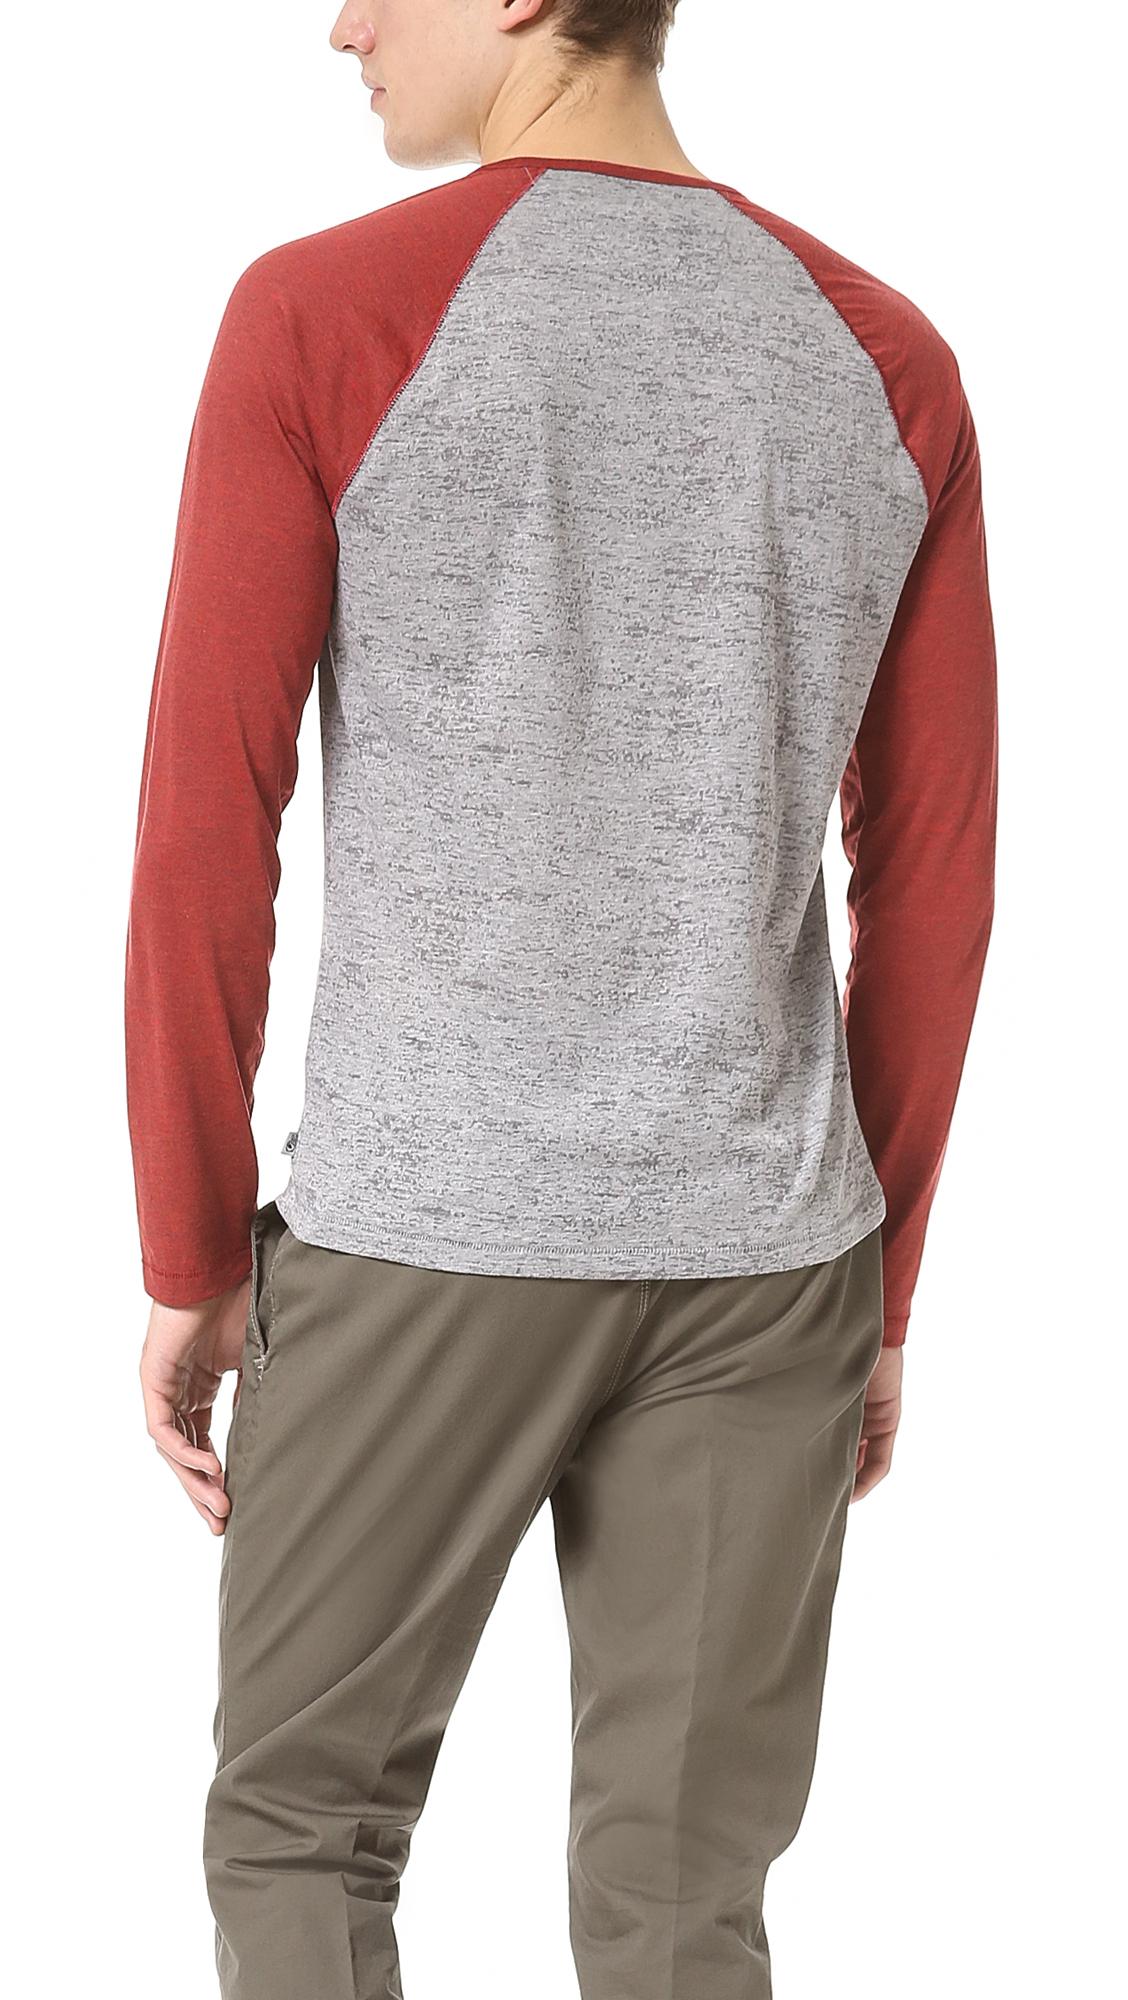 John Varvatos Long Sleeve Baseball T-Shirt in Grey Heather (Red) for Men